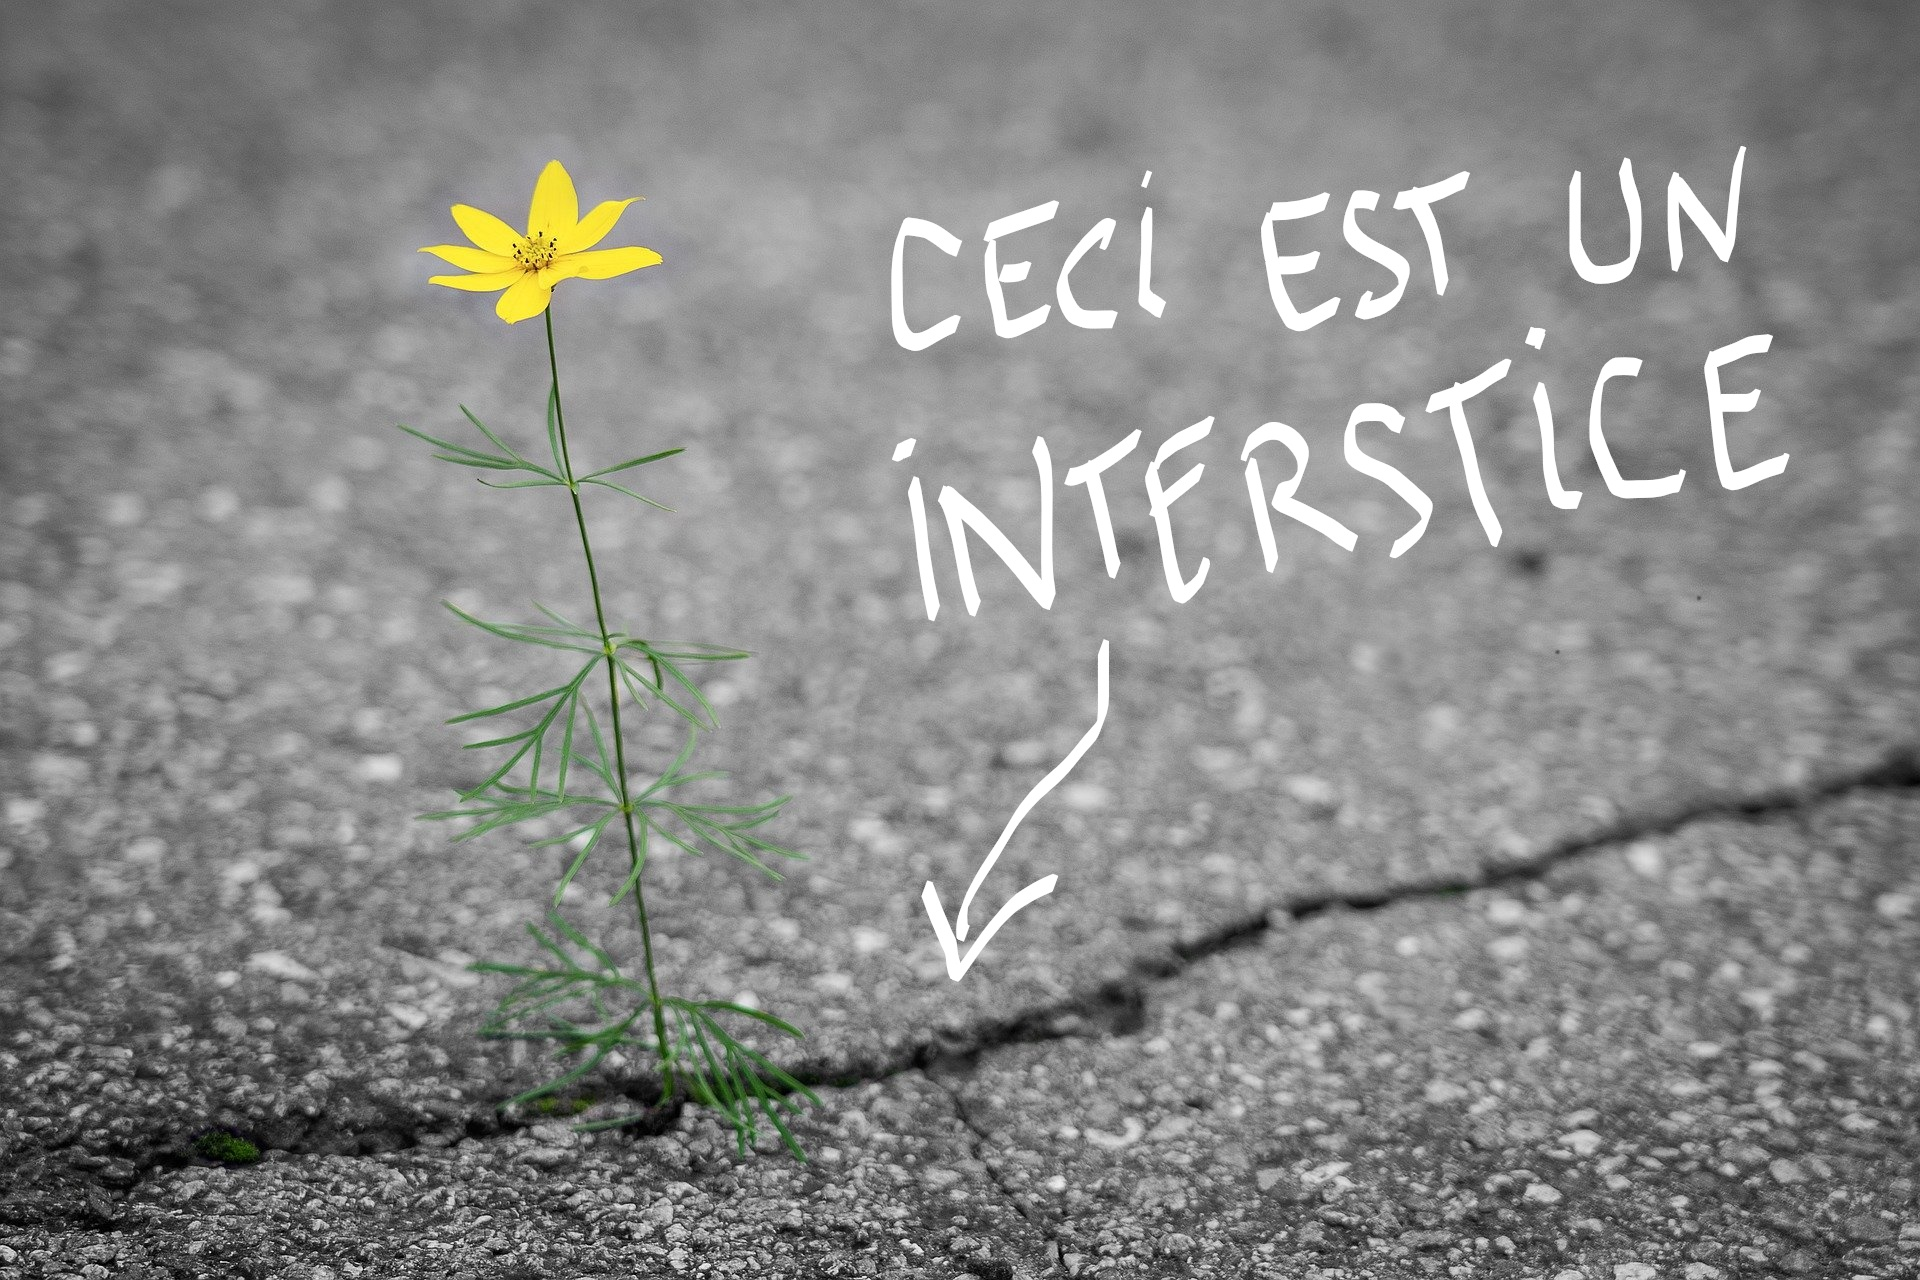 ceci_est_un_intersitice